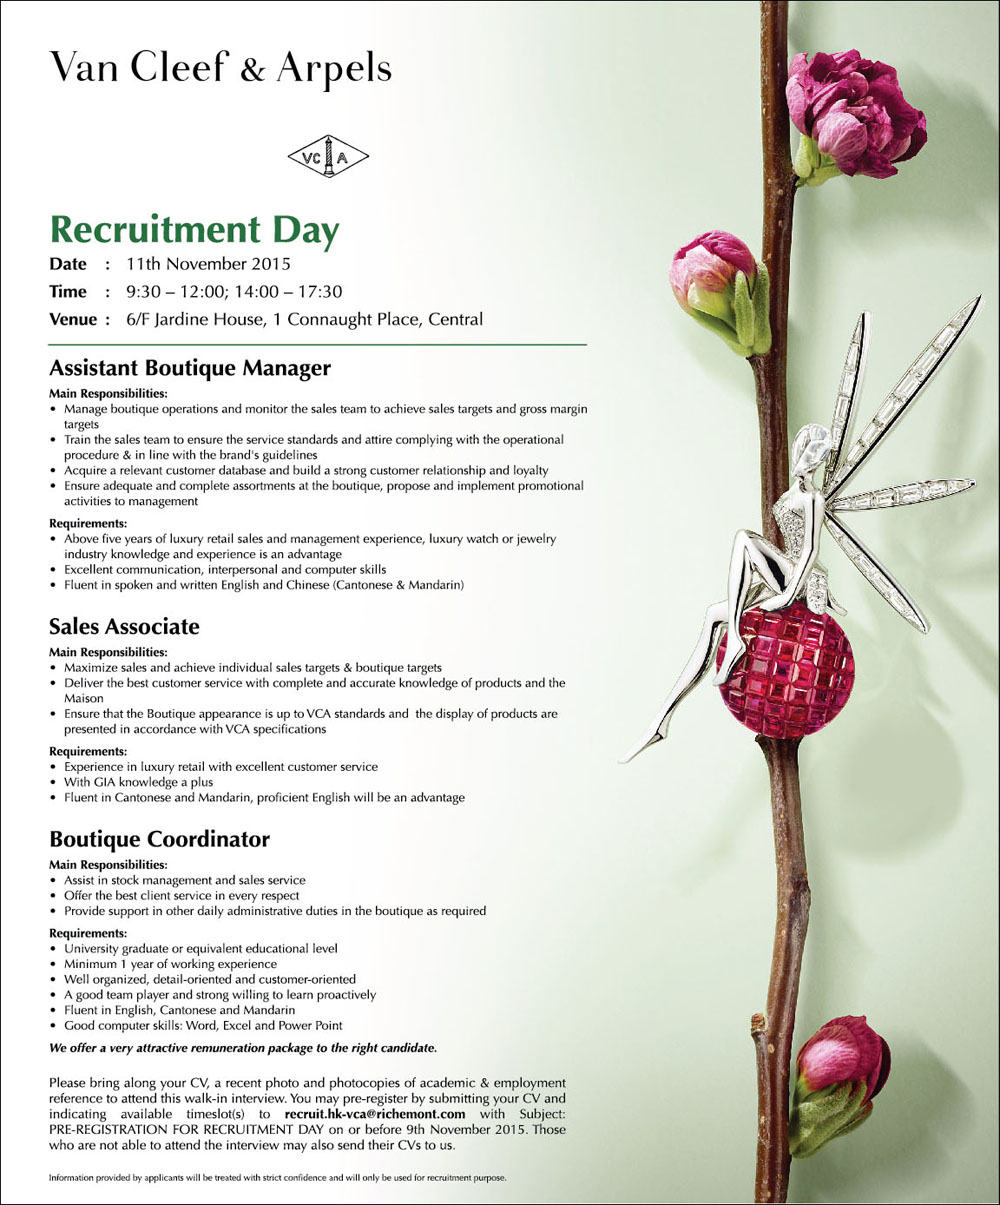 Van Cleef & Arpels Recruitment Day